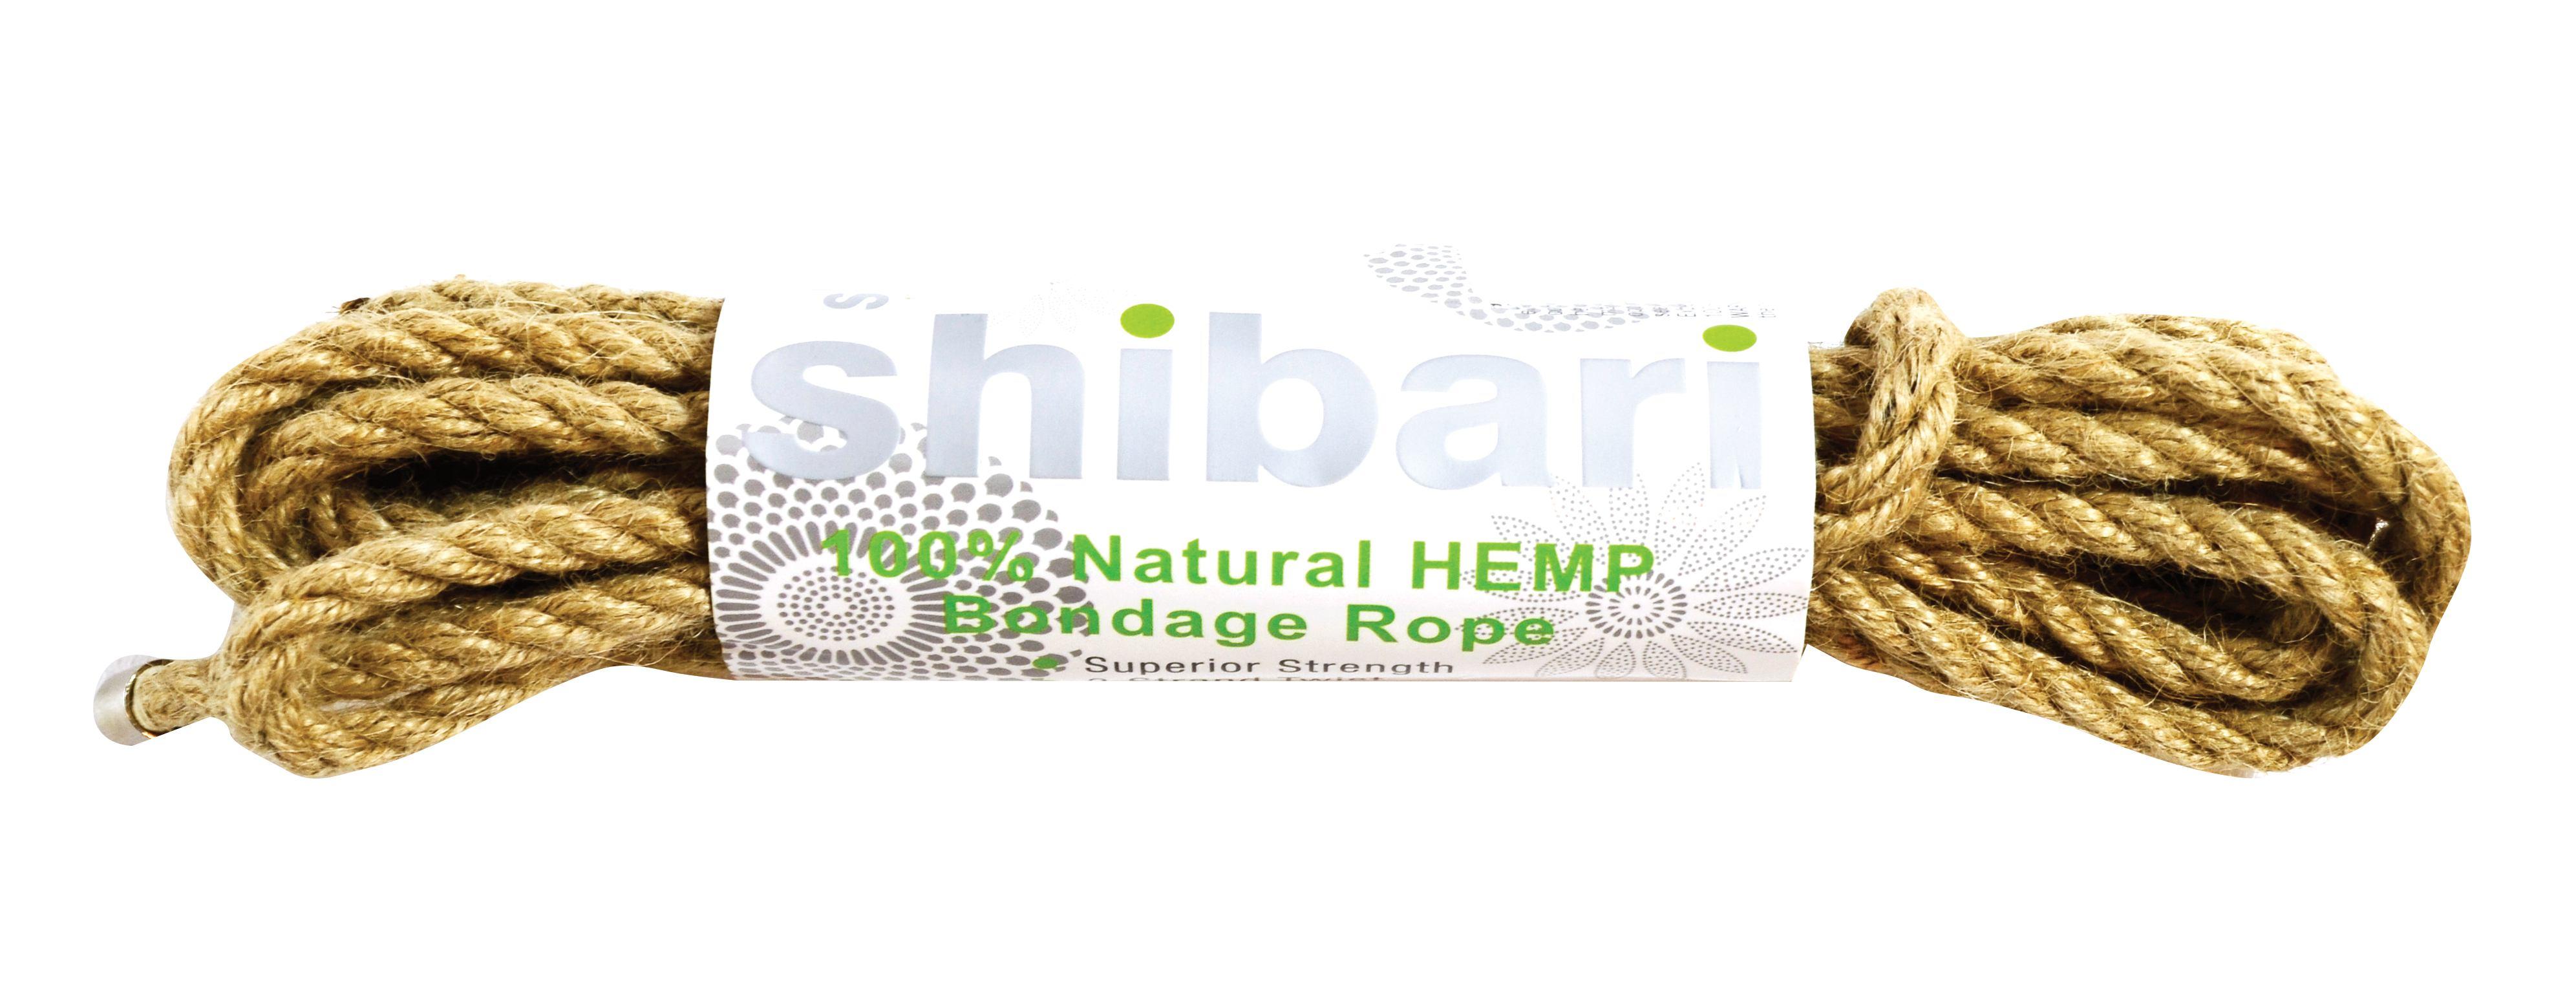 Shibari Rope 100% Natural Hemp 5m